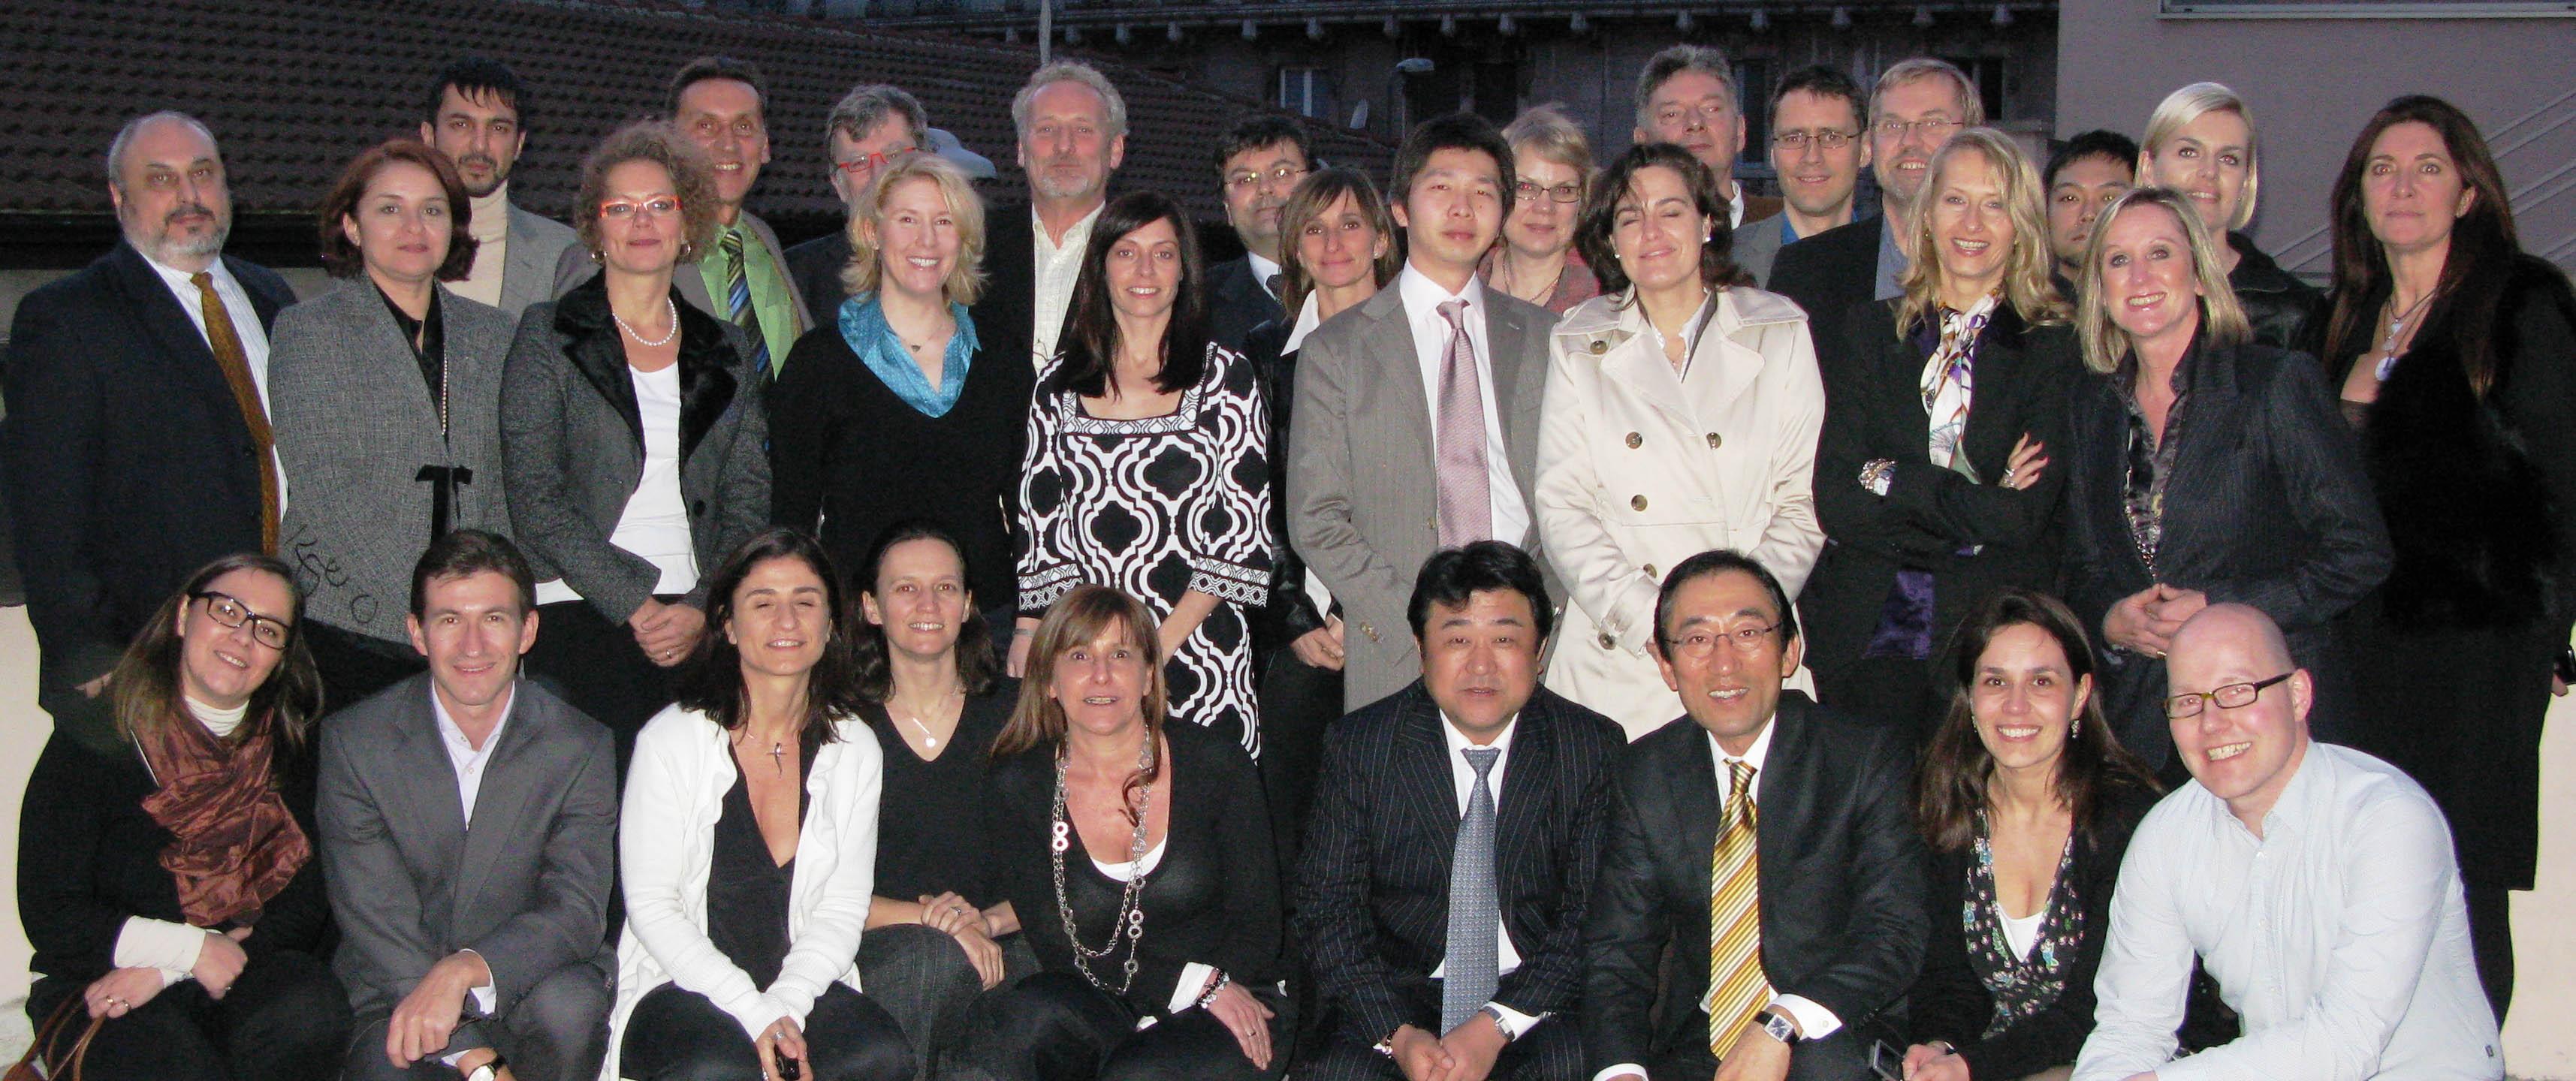 GlobalCom Meeting in Milano, February 2009